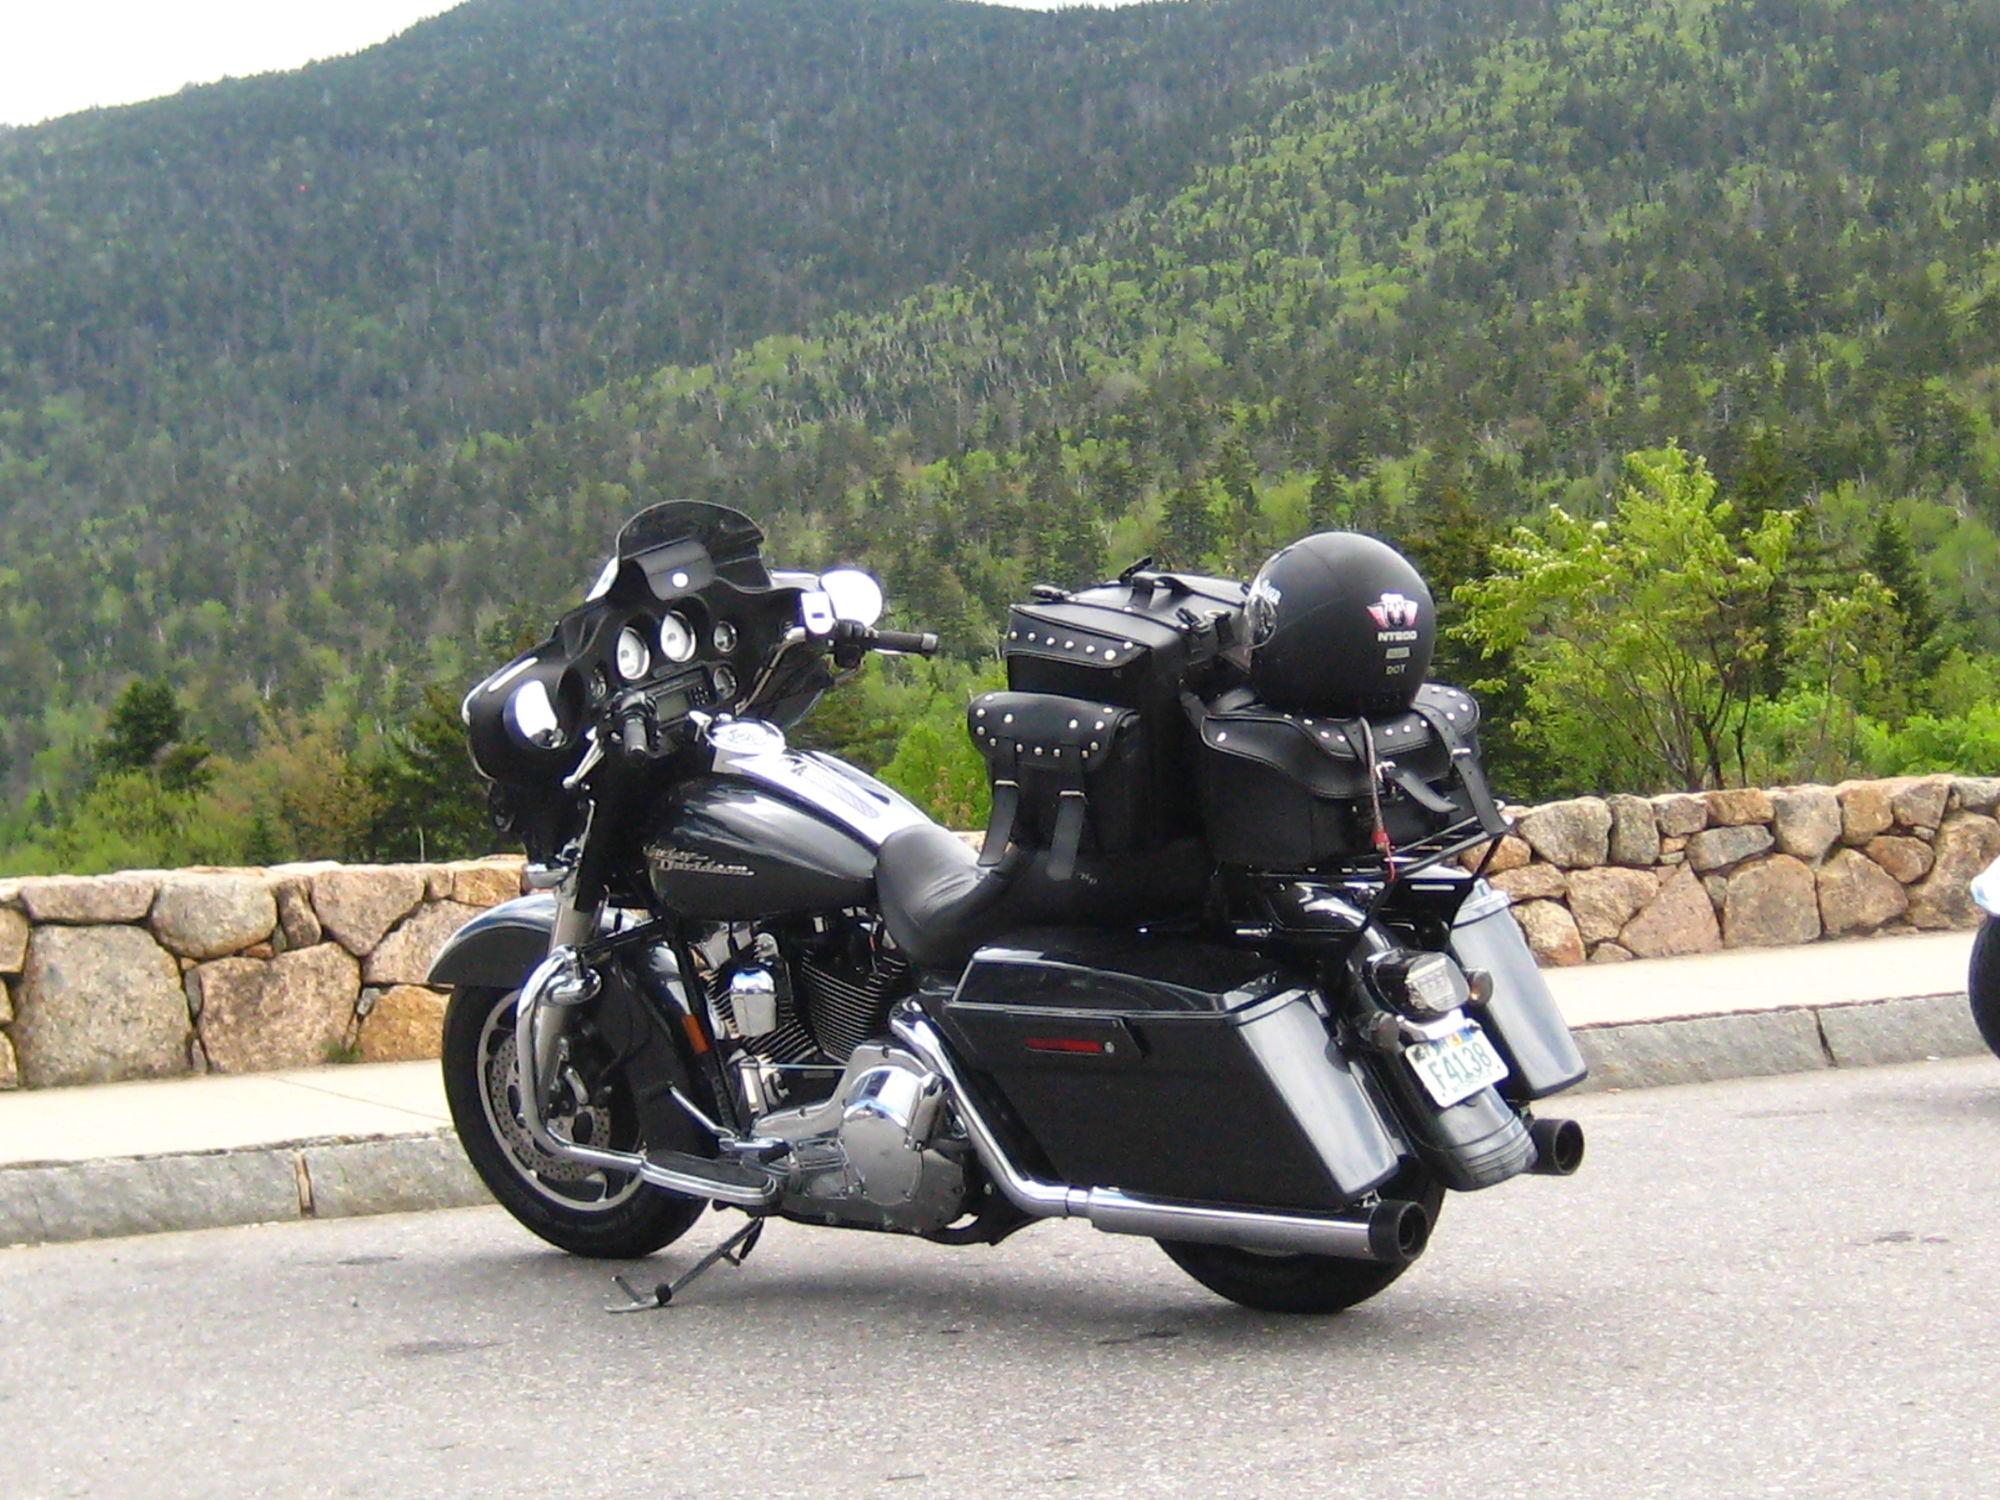 Vaydor For Sale Craigslist >> 2000 Harley Truck For Sale.html | Autos Post